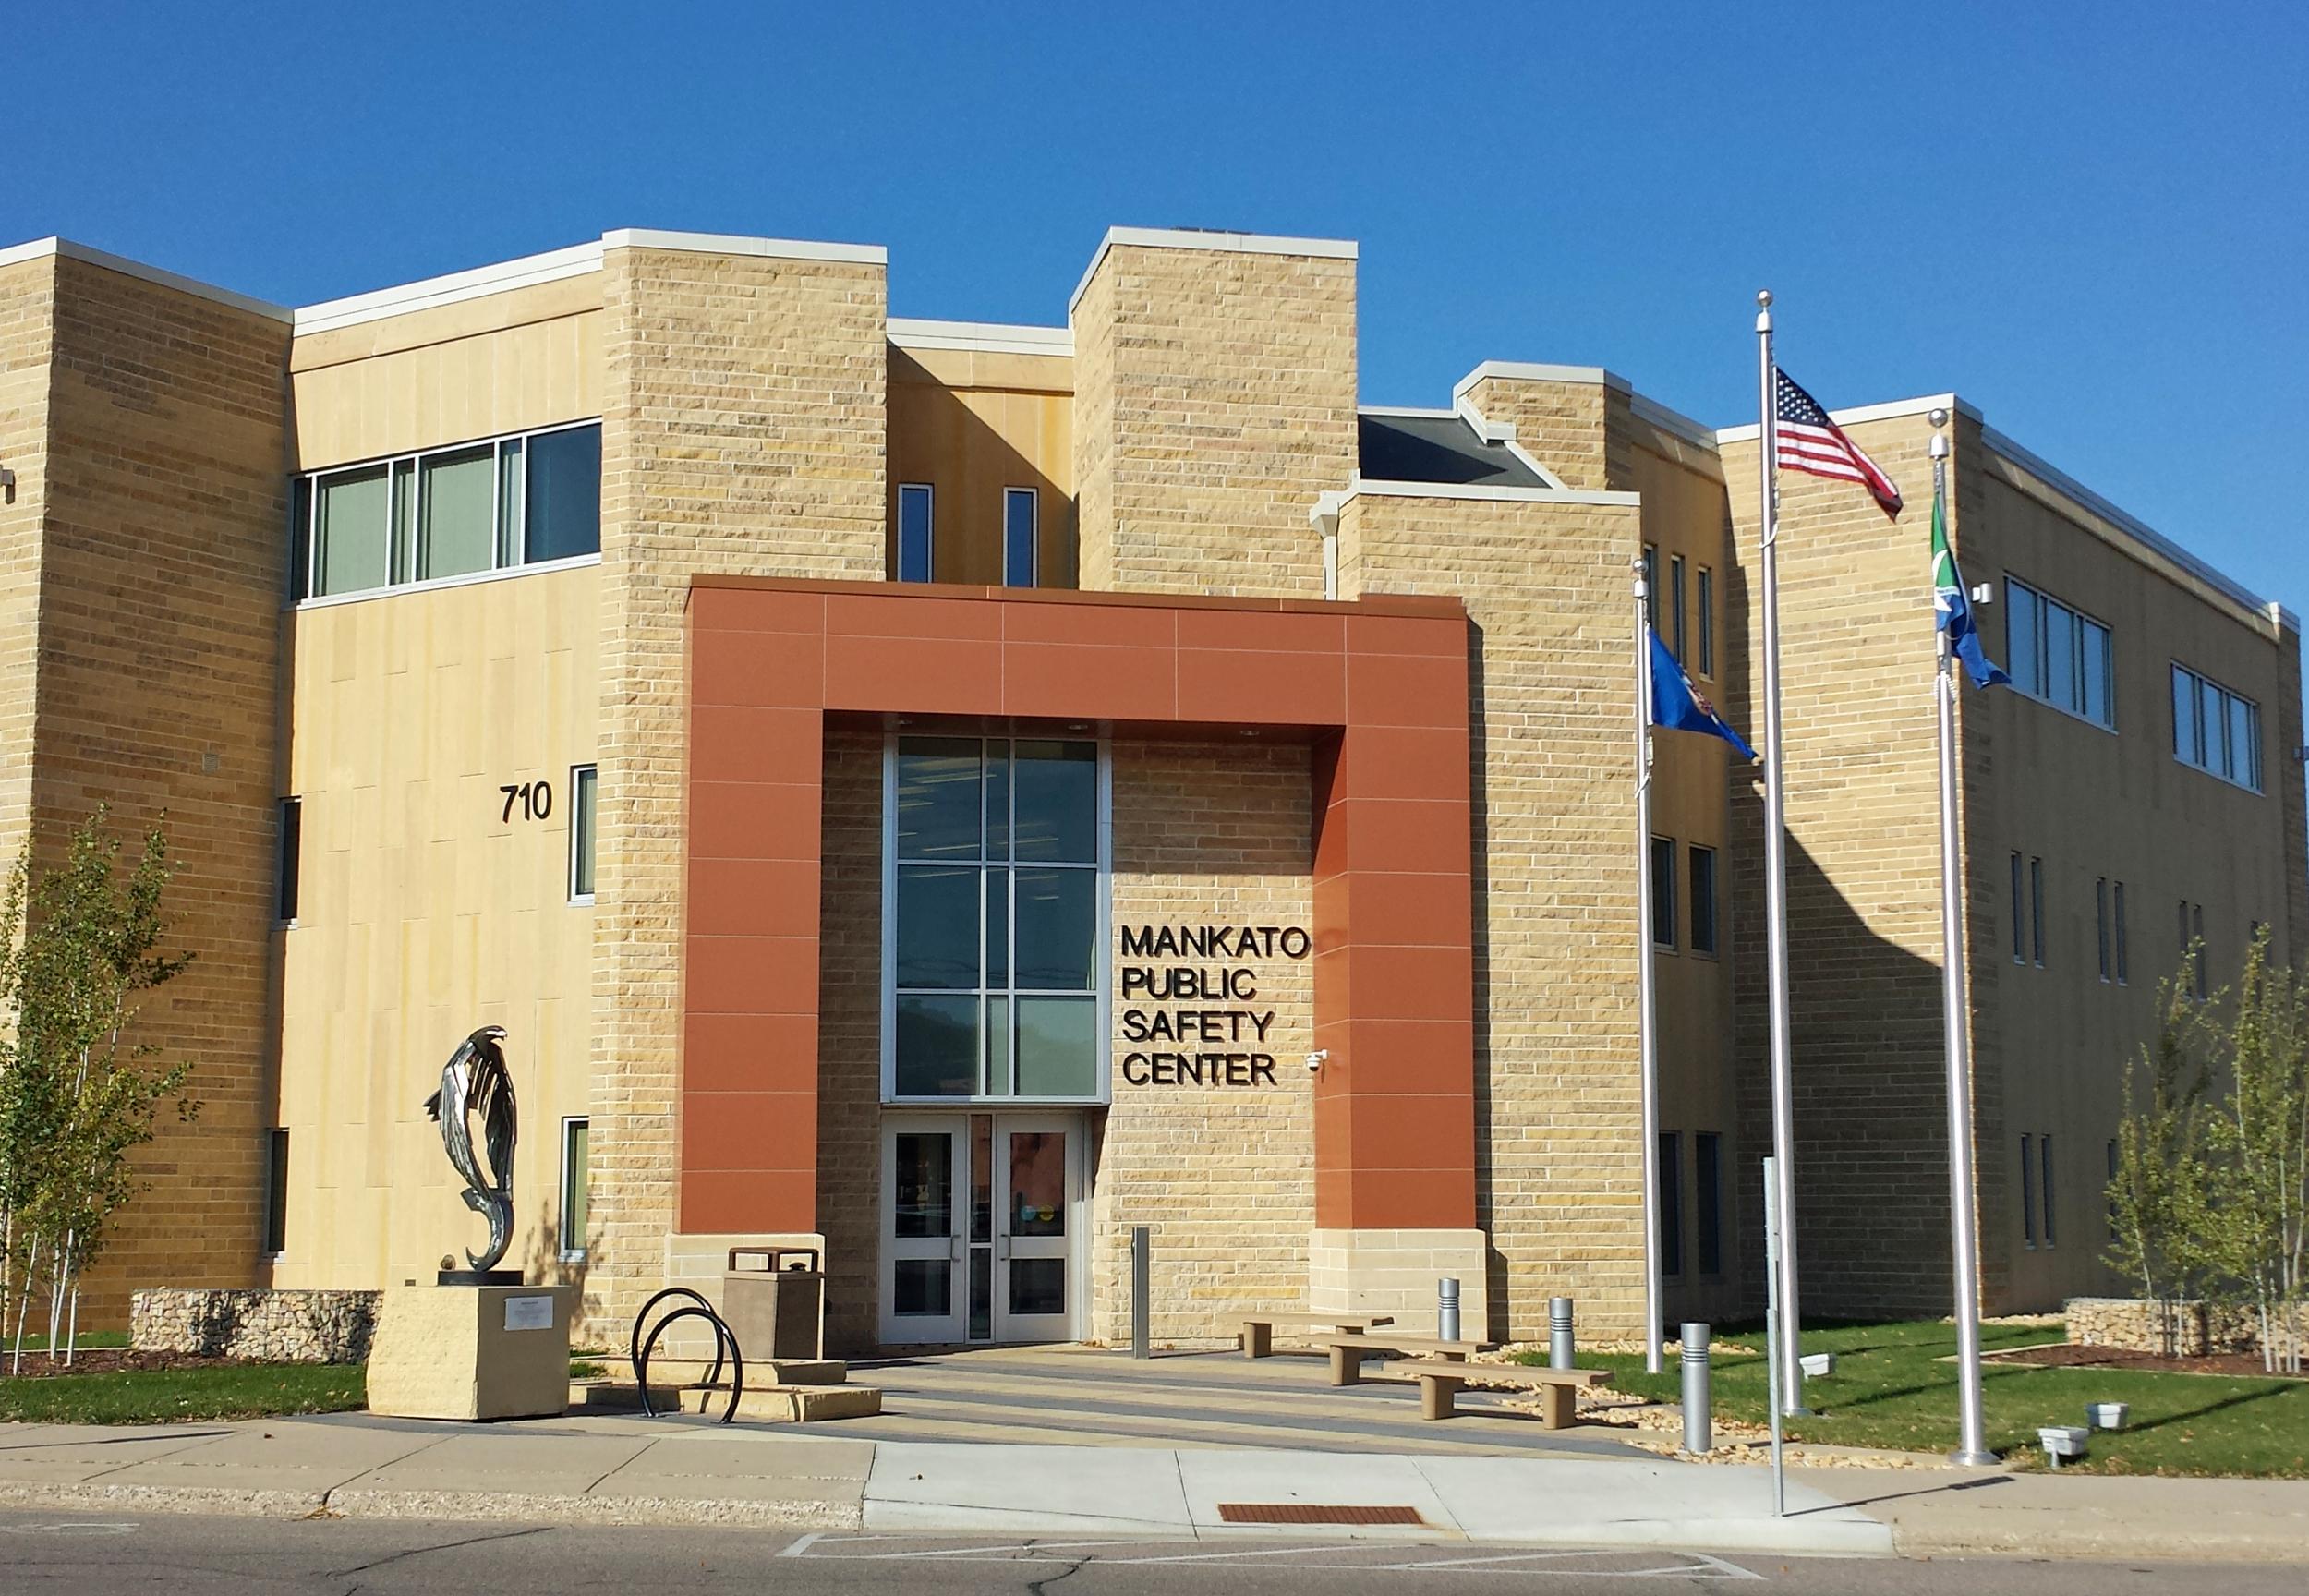 Mankato Public Safety Center